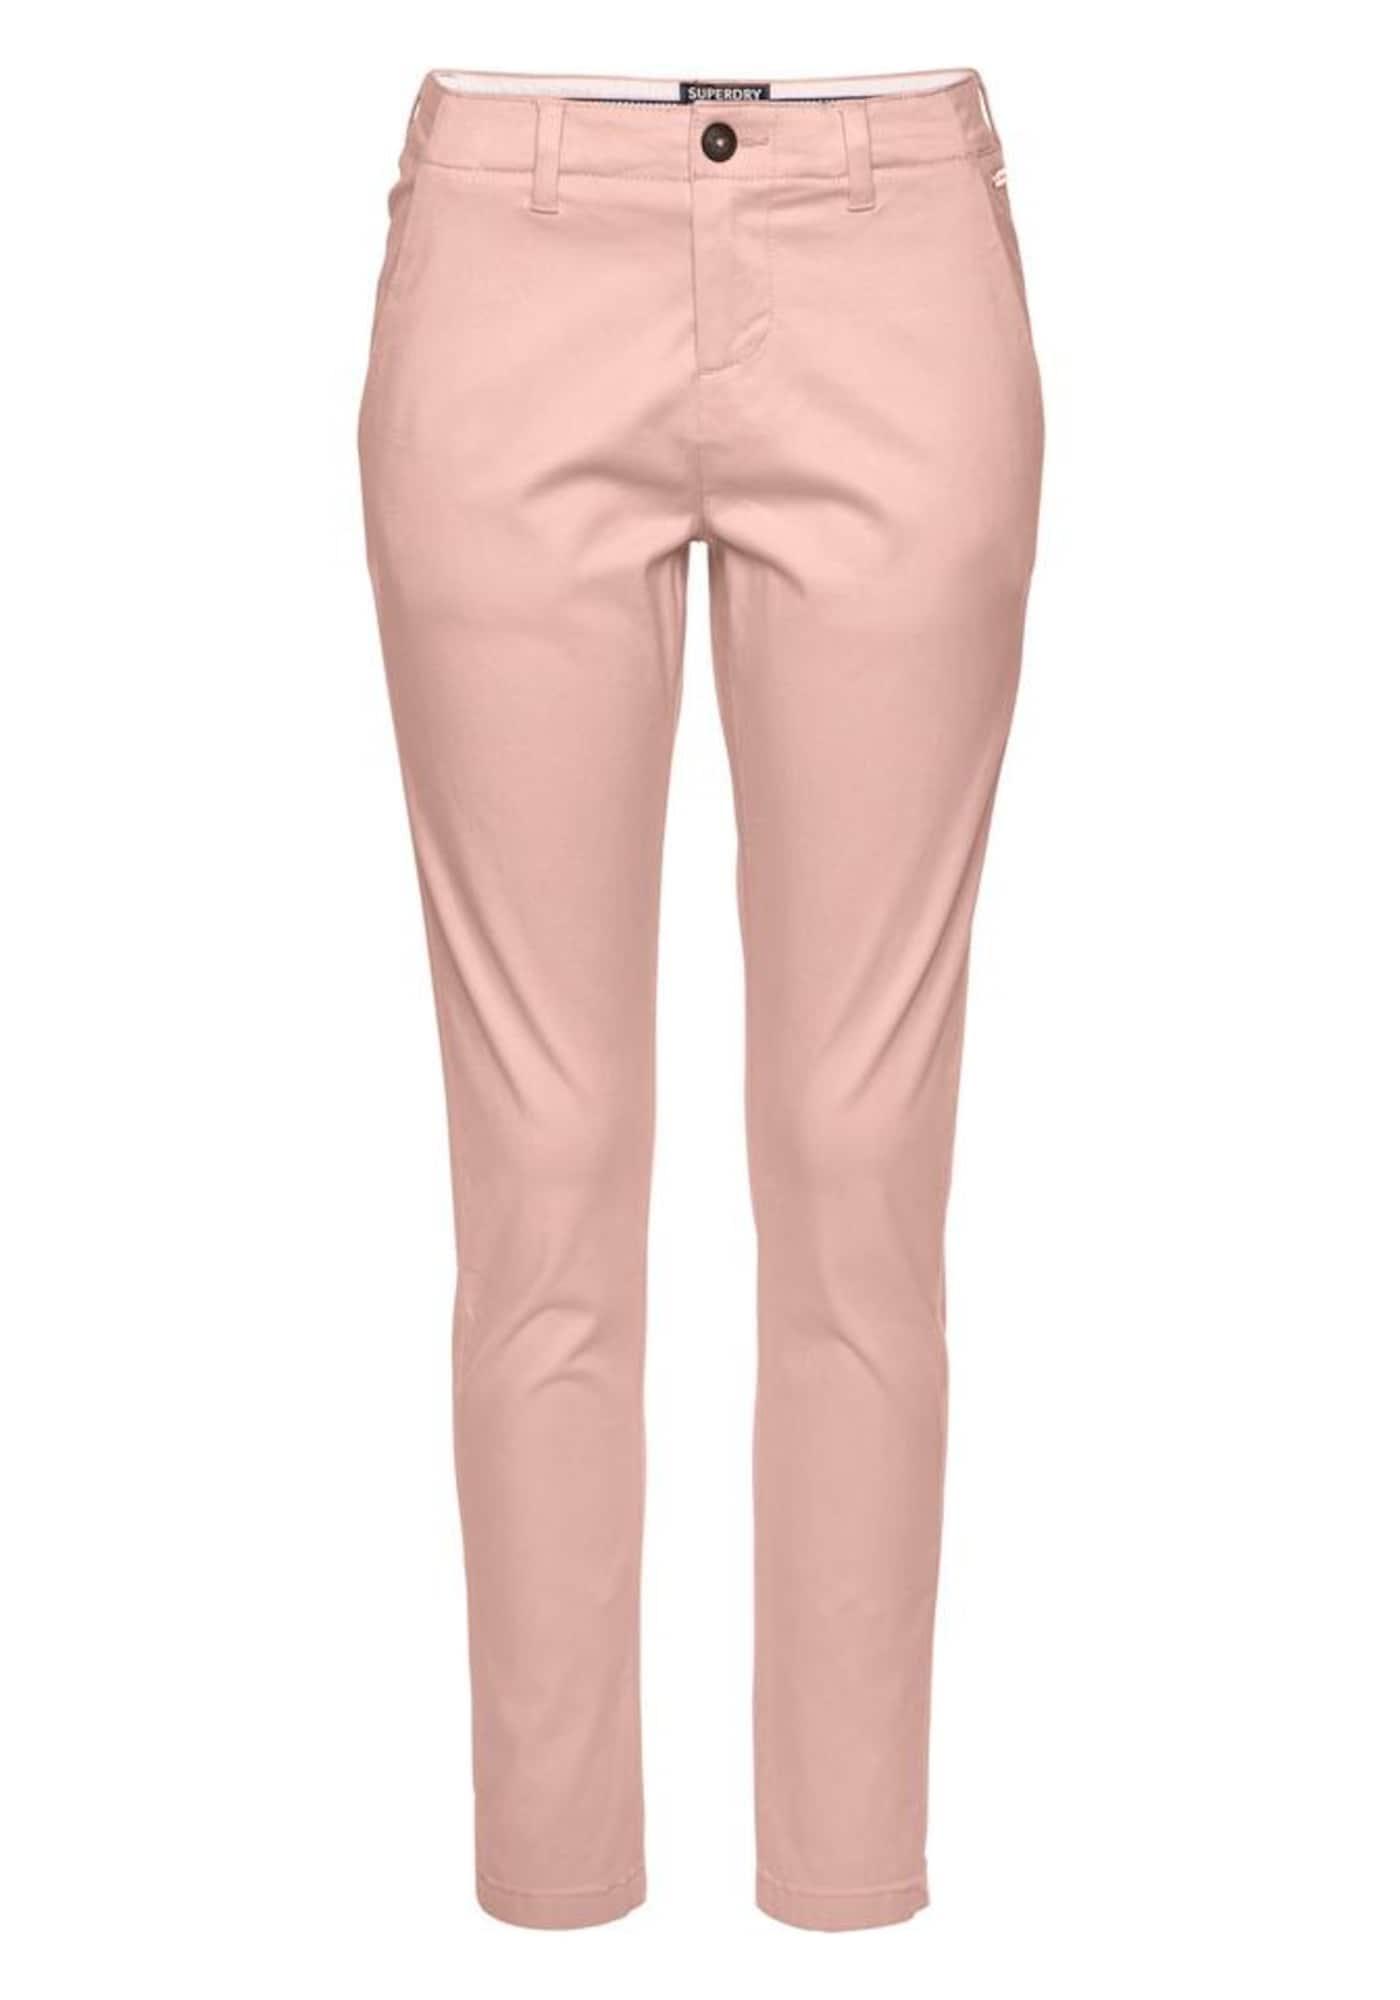 Chino kalhoty starorůžová Superdry